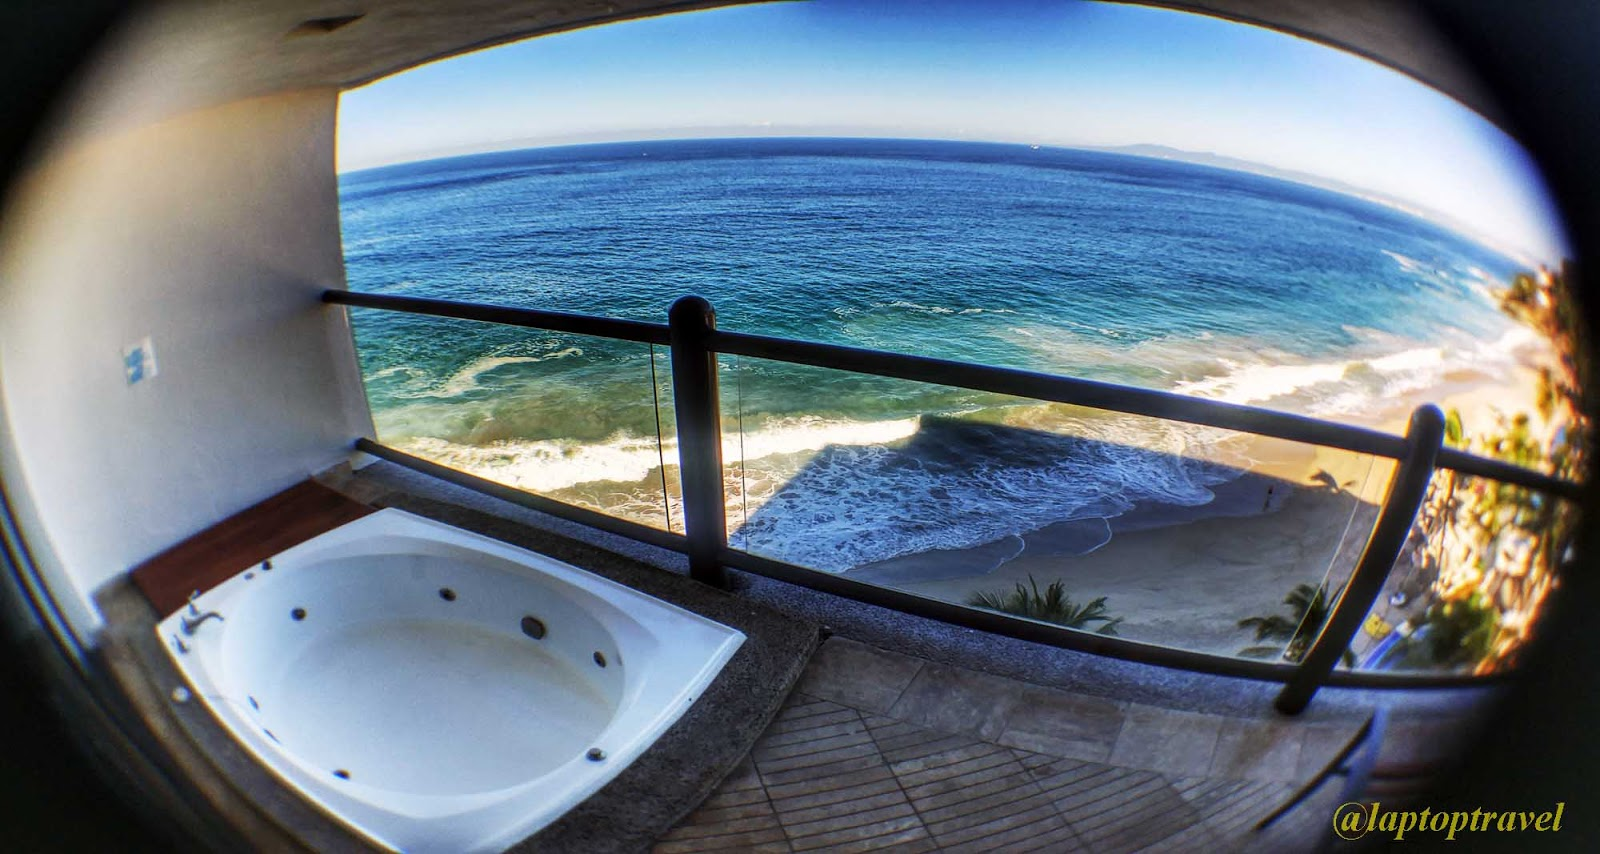 Hyatt Ziva Puerto Vallarta Mexico All-Inclusive Beach and Spa Resort ...